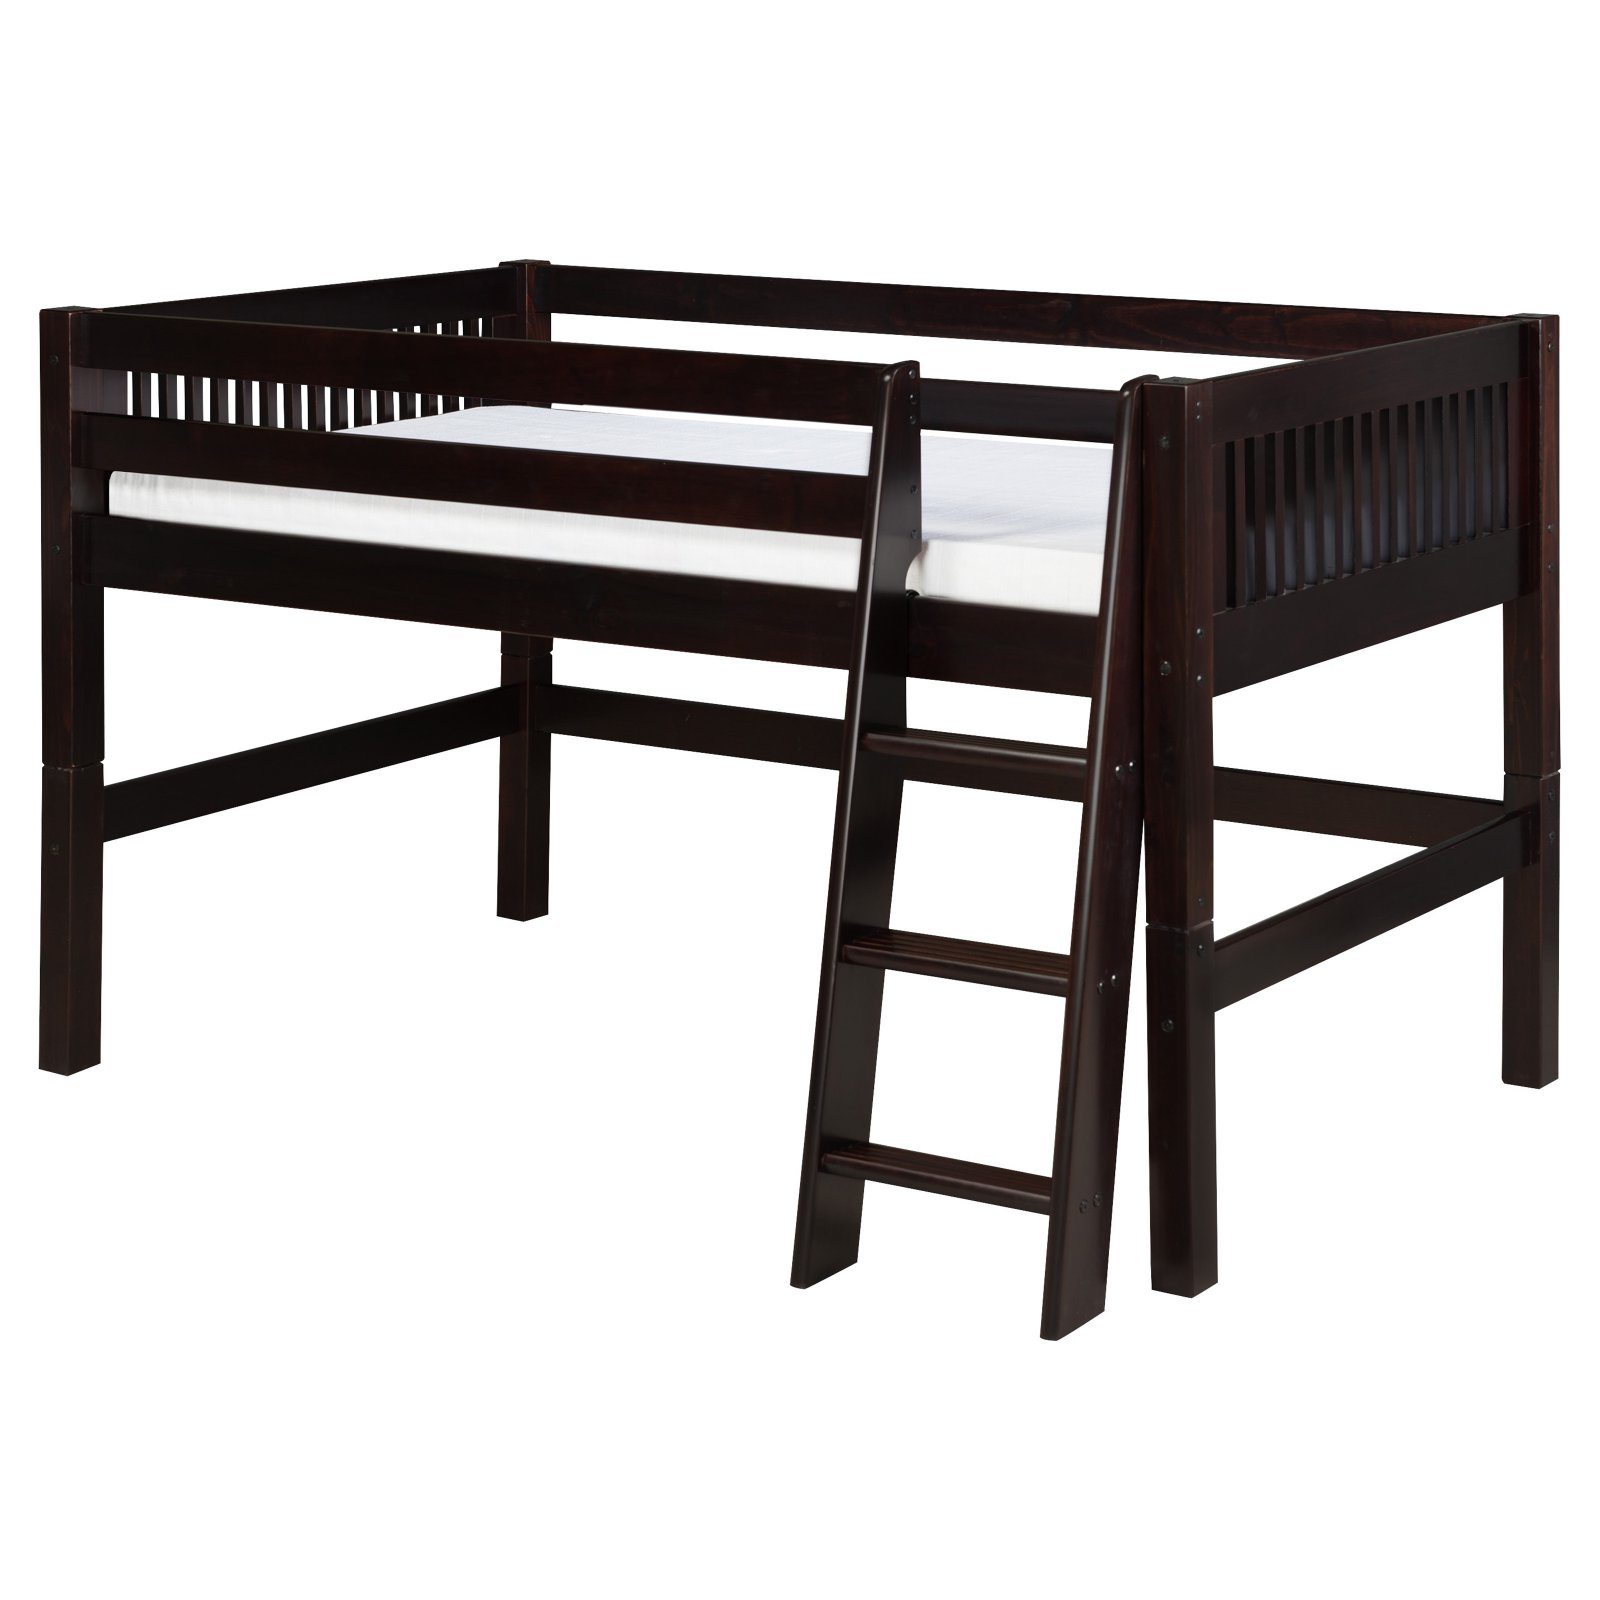 Camaflexi Full Size Low Loft Bed Mission Headboard White Finish by EcoFlex Furniture